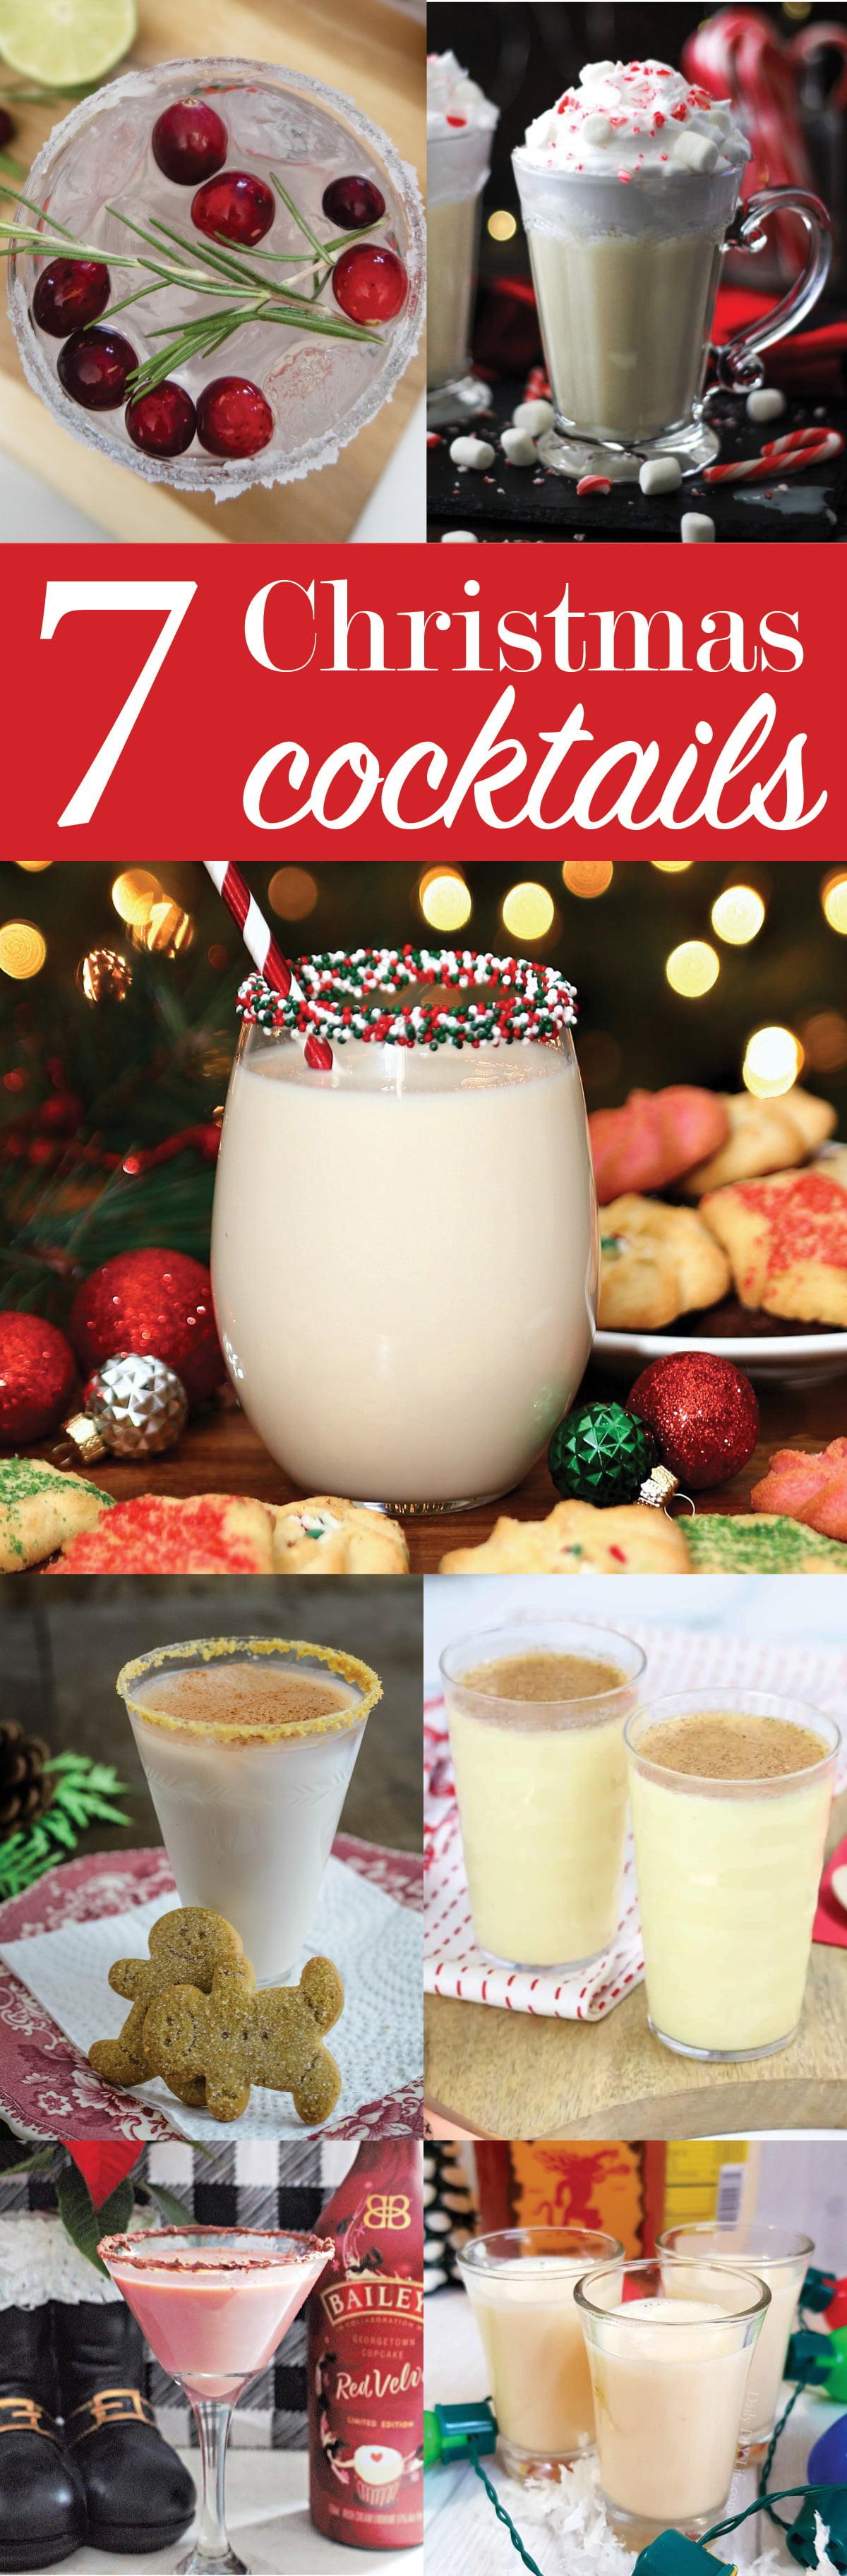 7 Christmas Cocktails